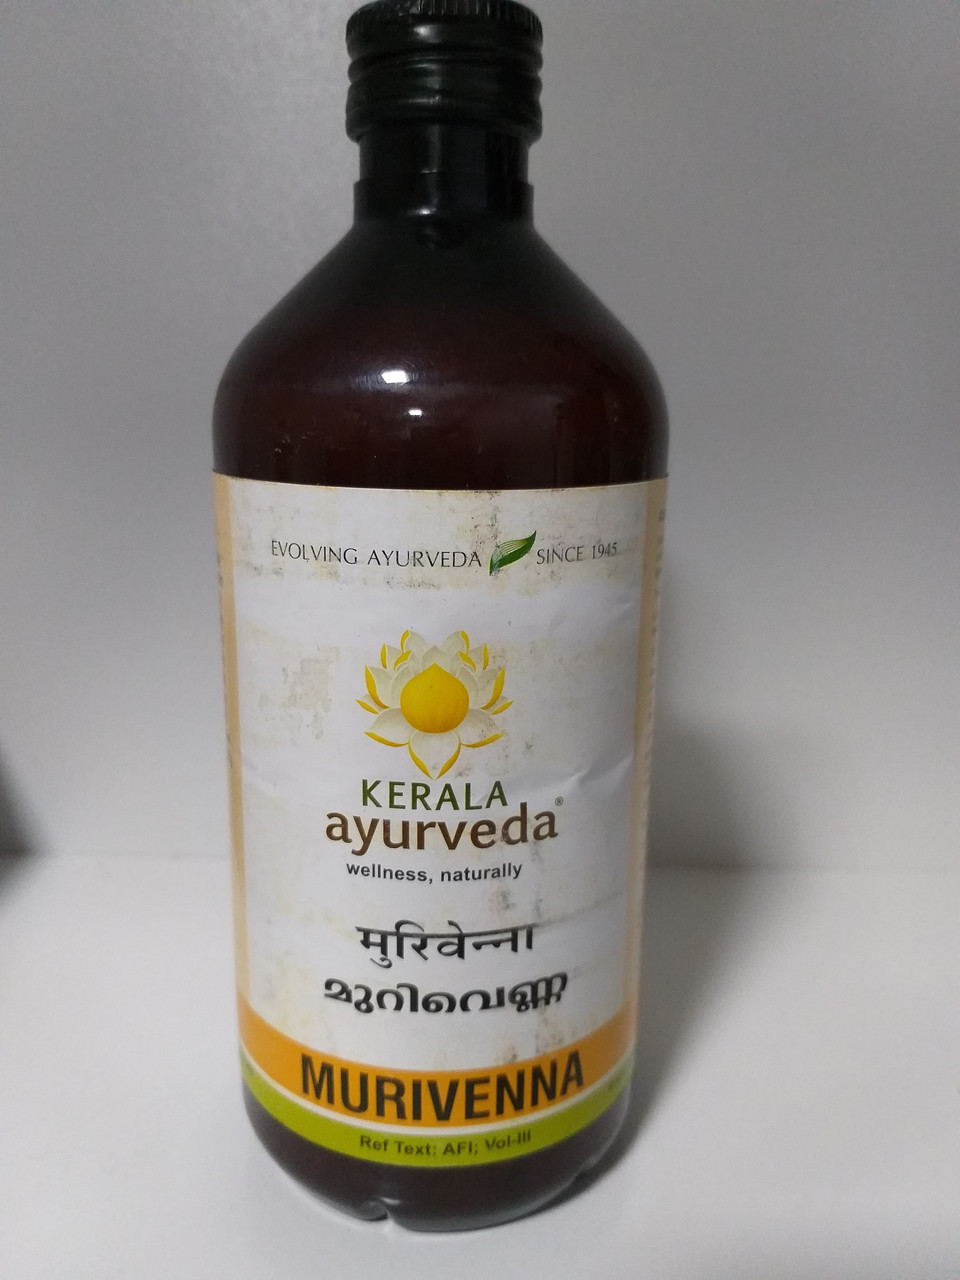 Масло для массажа  Муривенна, 450 мл, Murivenna Thailam, Kerala Ayurveda